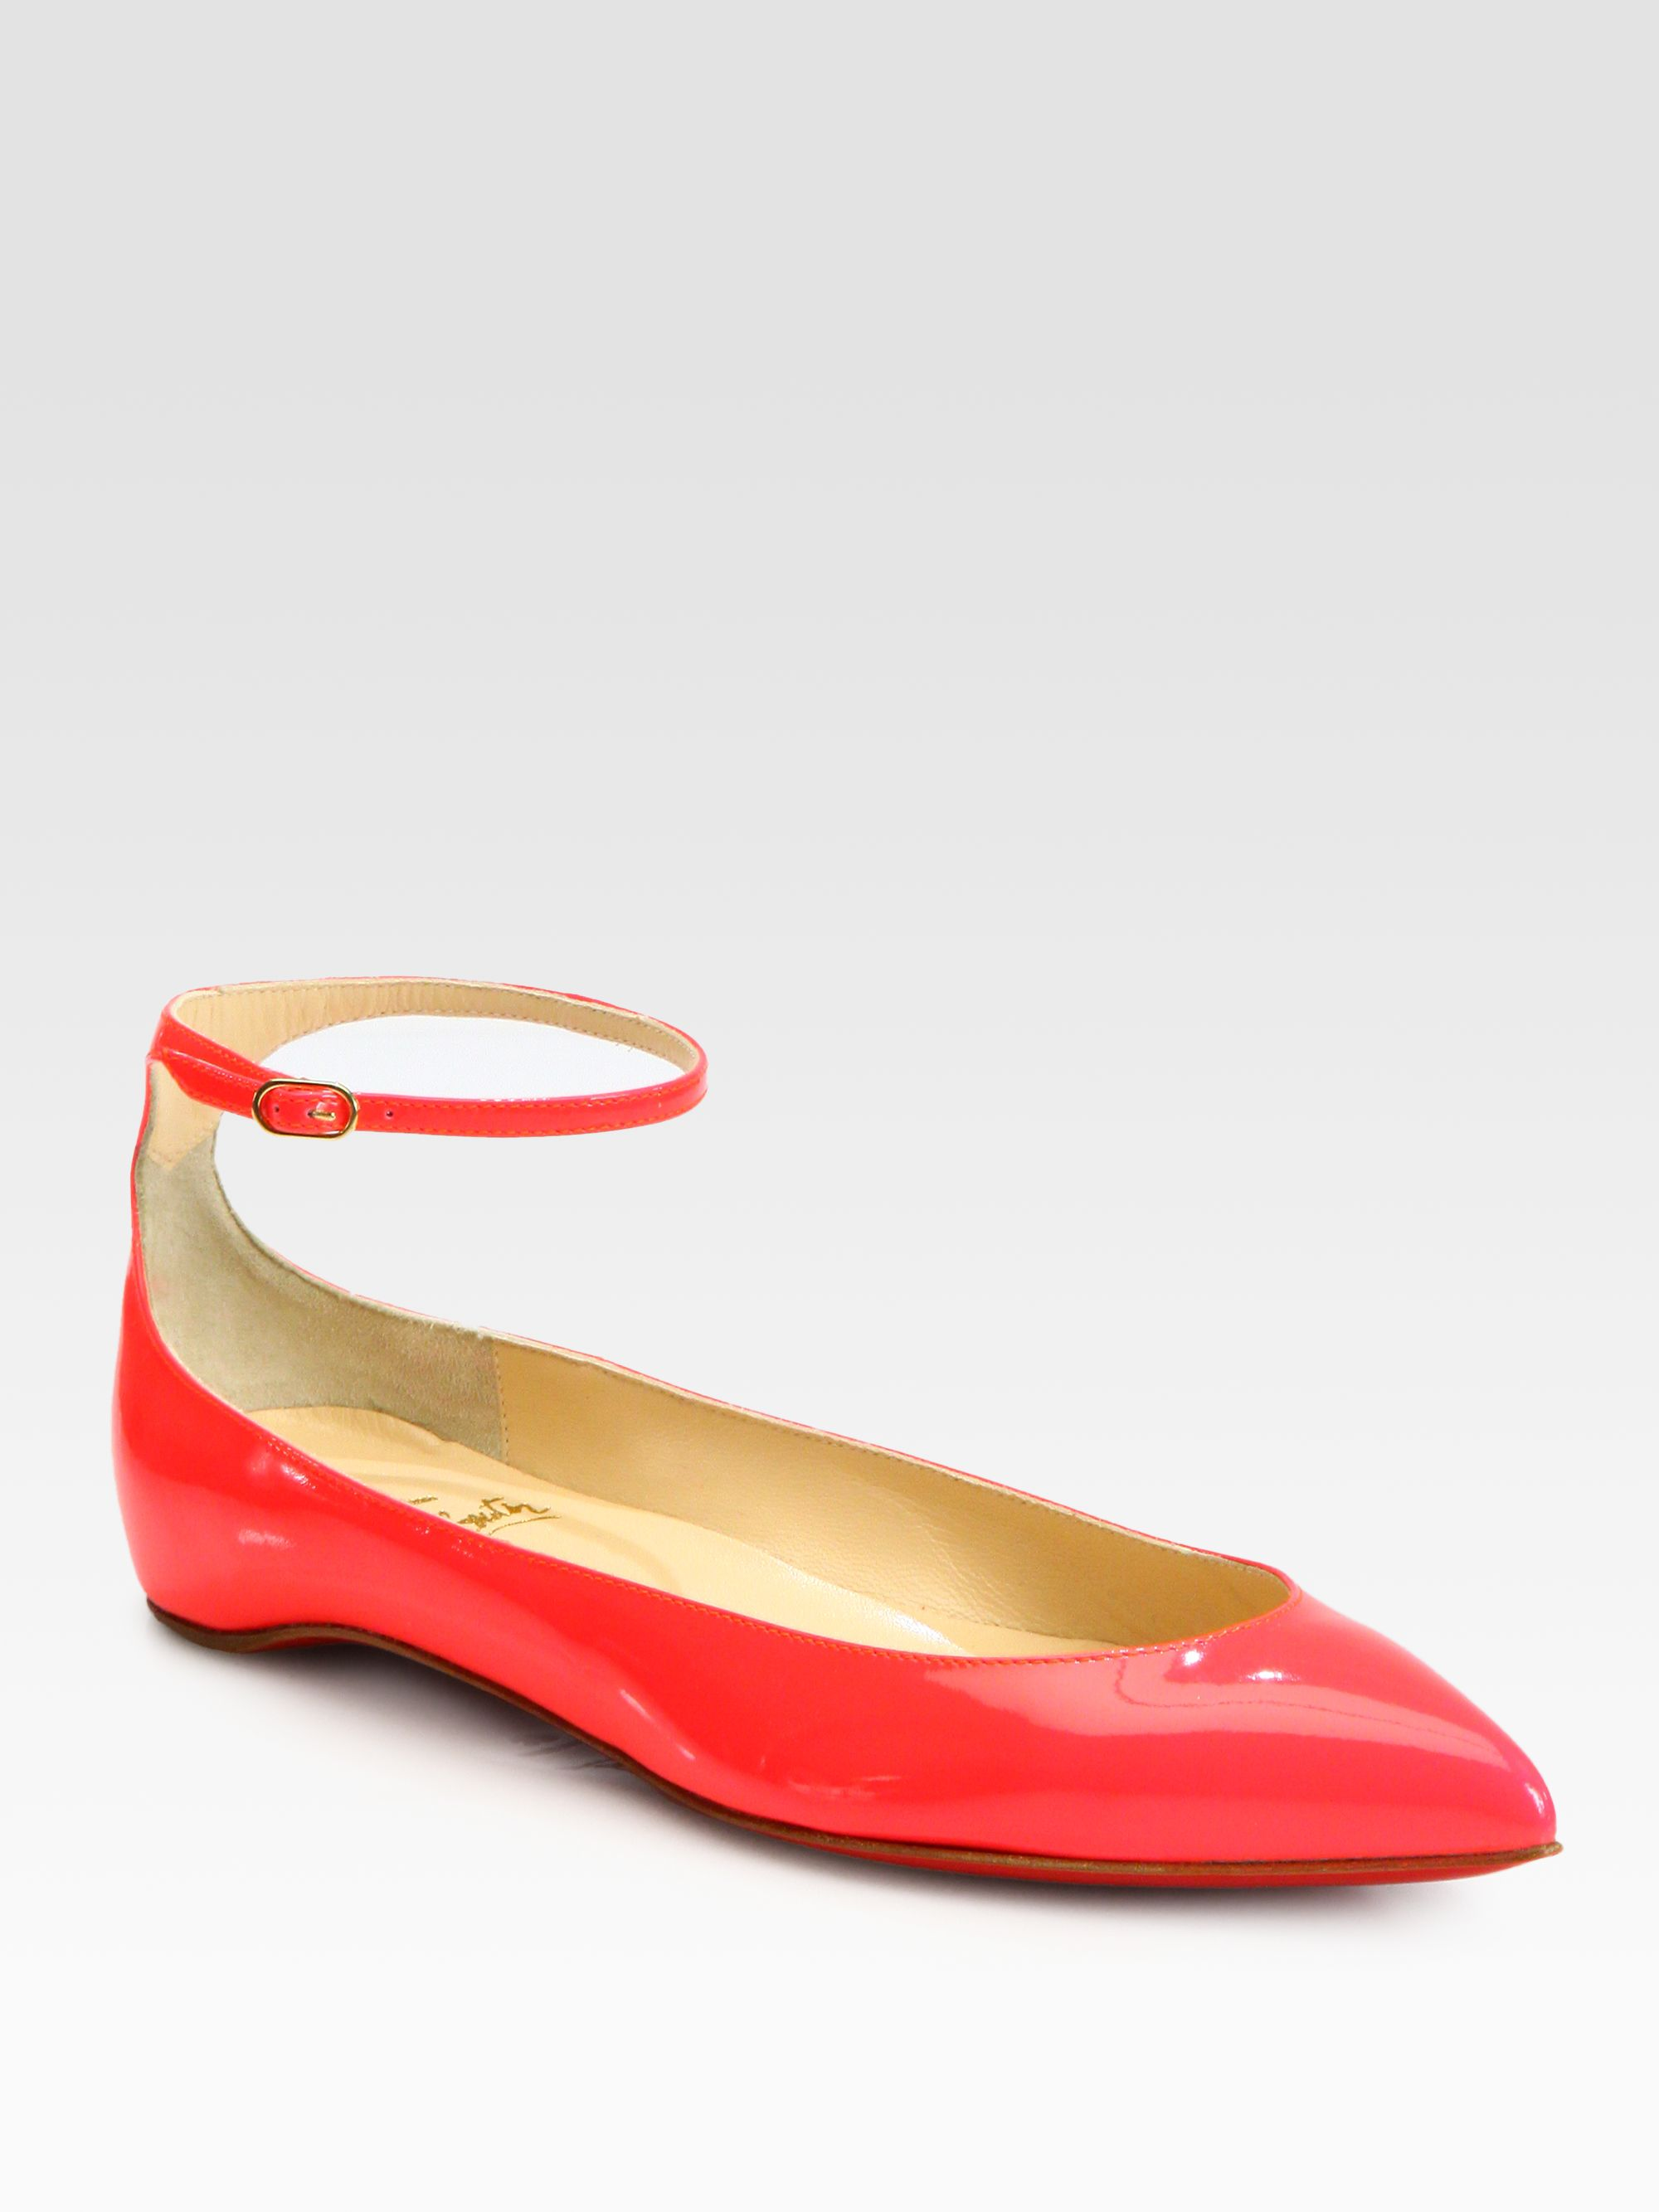 d5b7b672b683 Lyst - Christian Louboutin Mrs H Patent Leather Ankle Strap Ballet ...